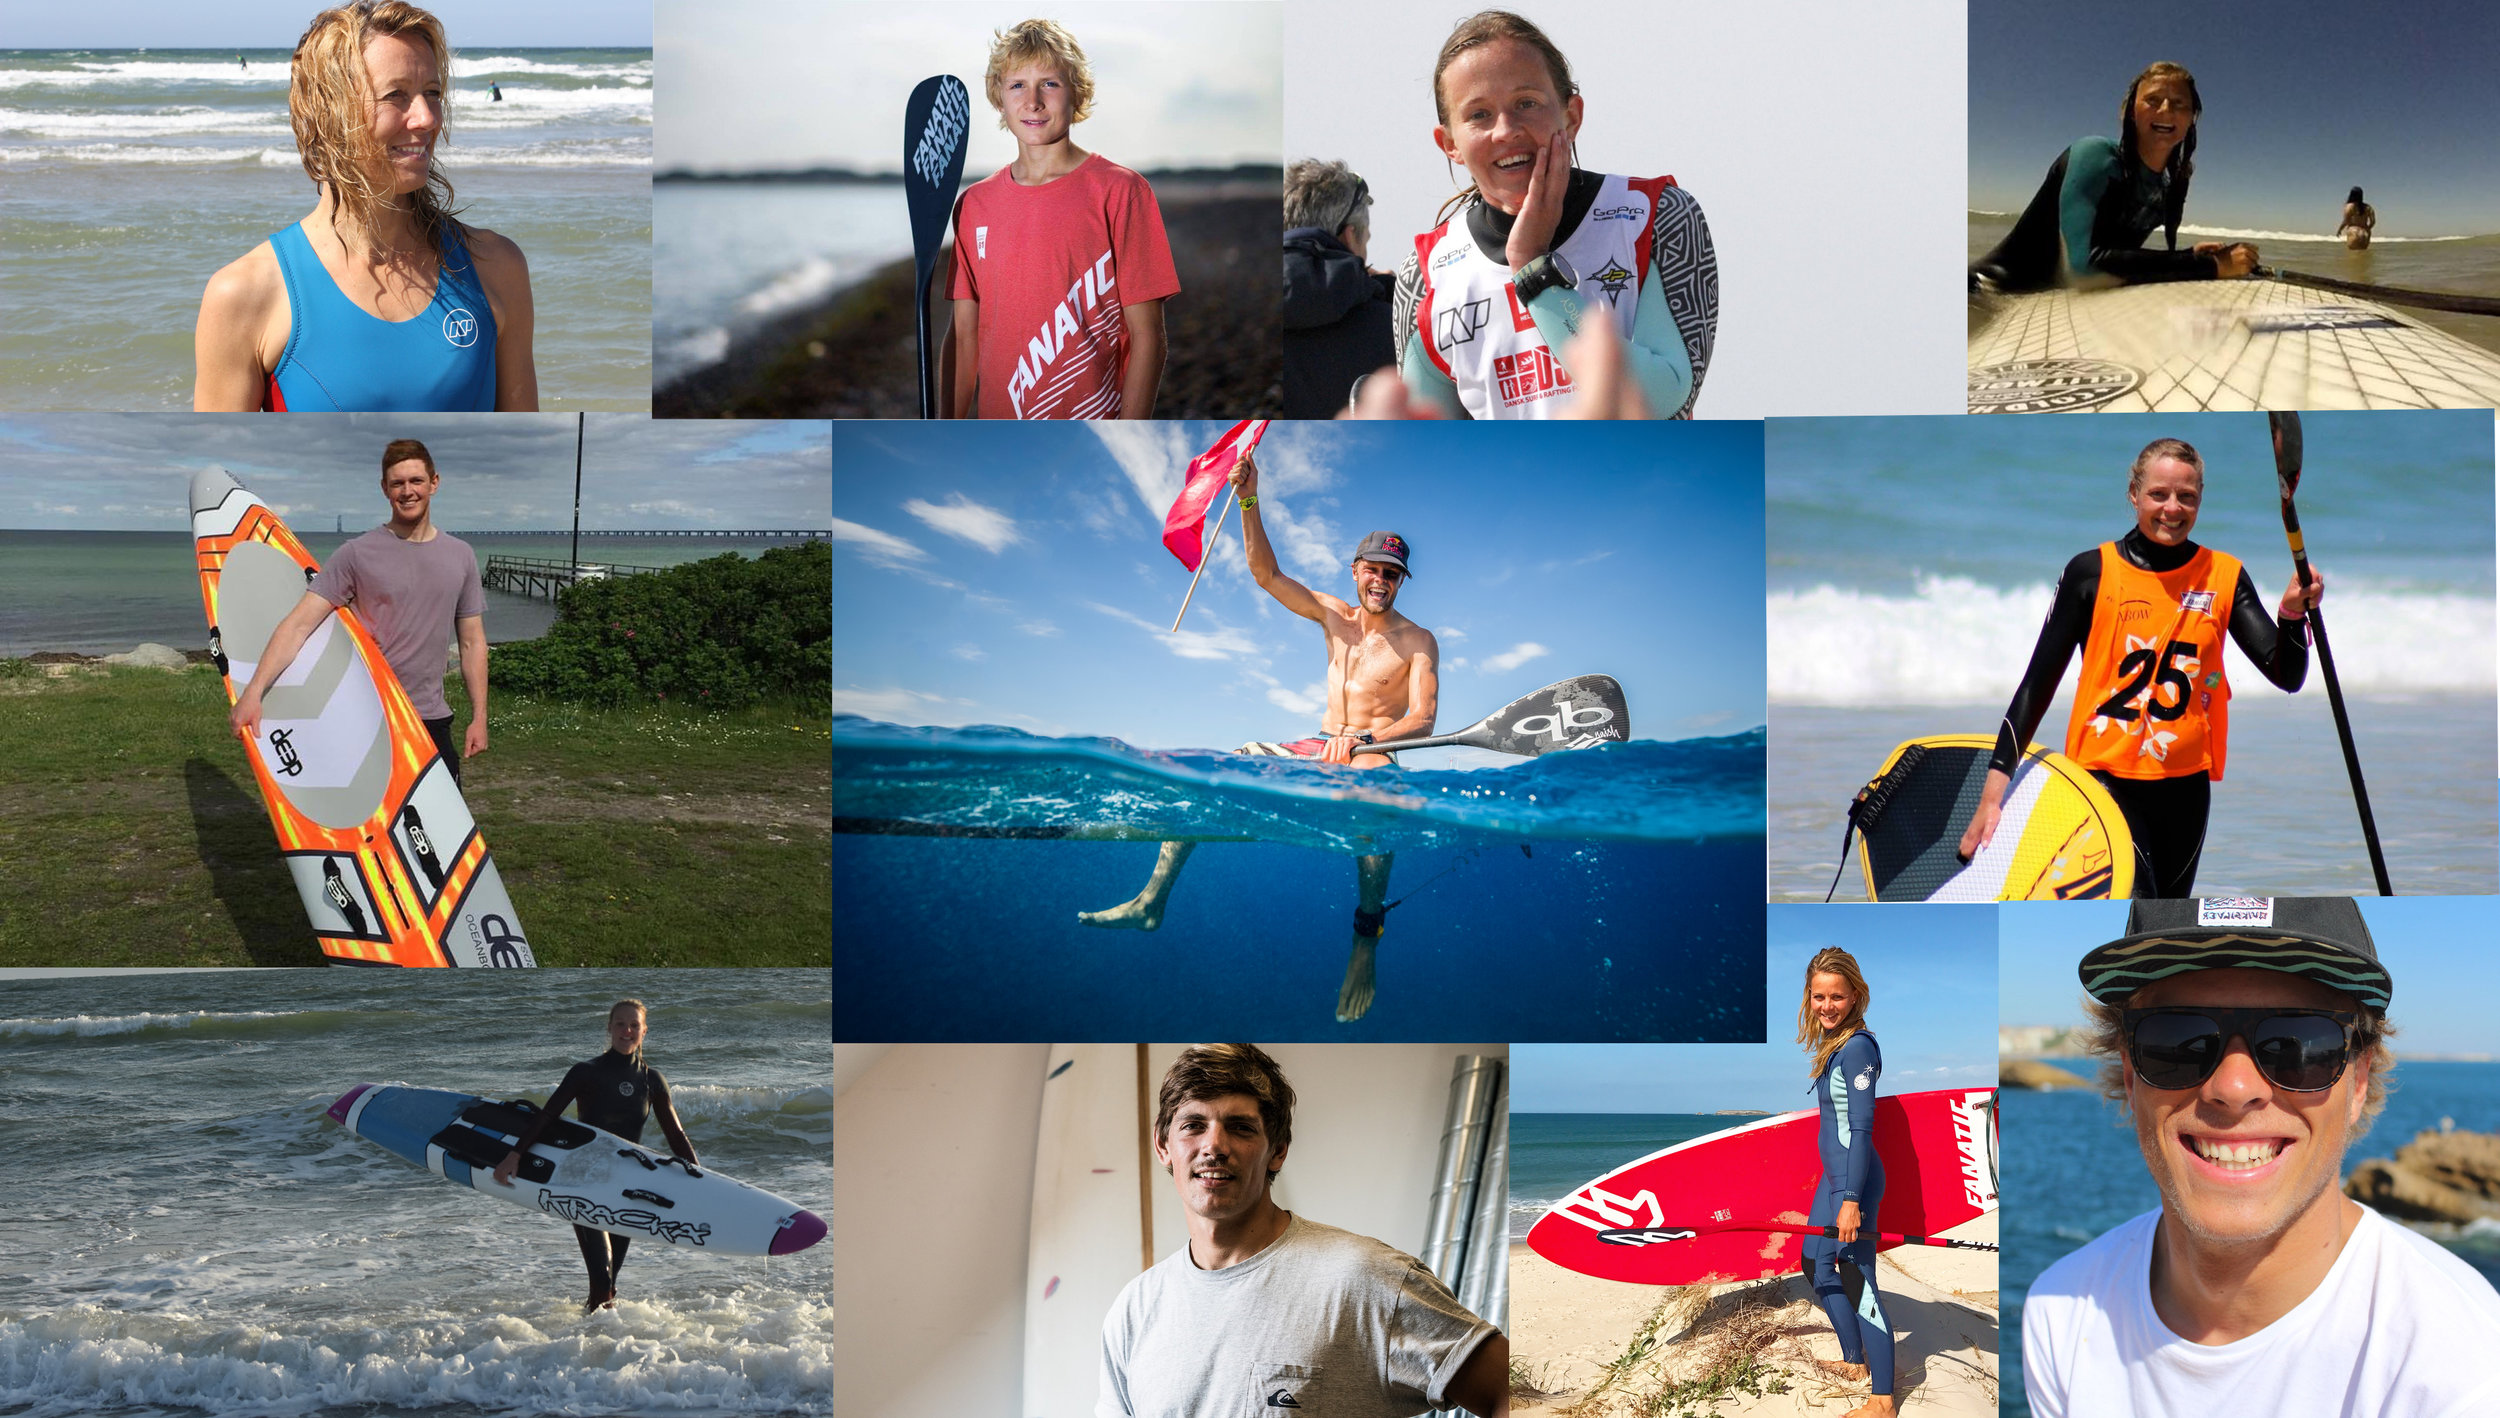 The Danish team -